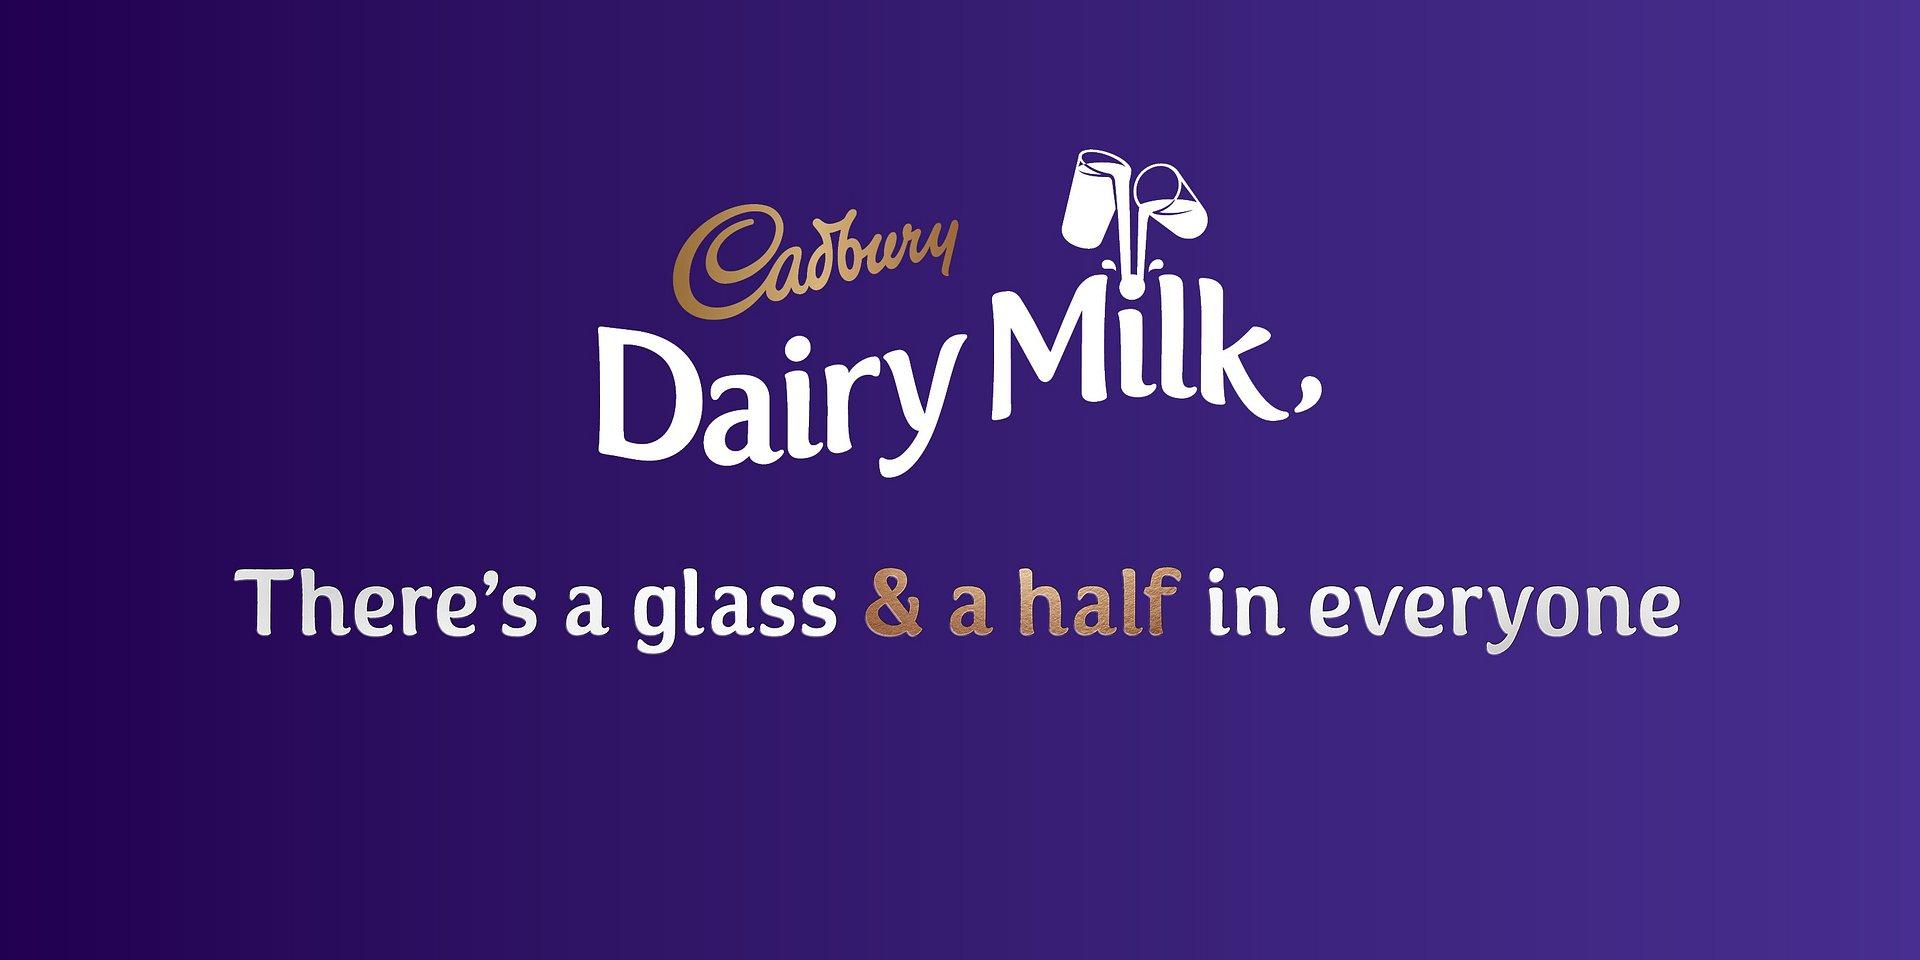 Unlock the Joy with Cadbury